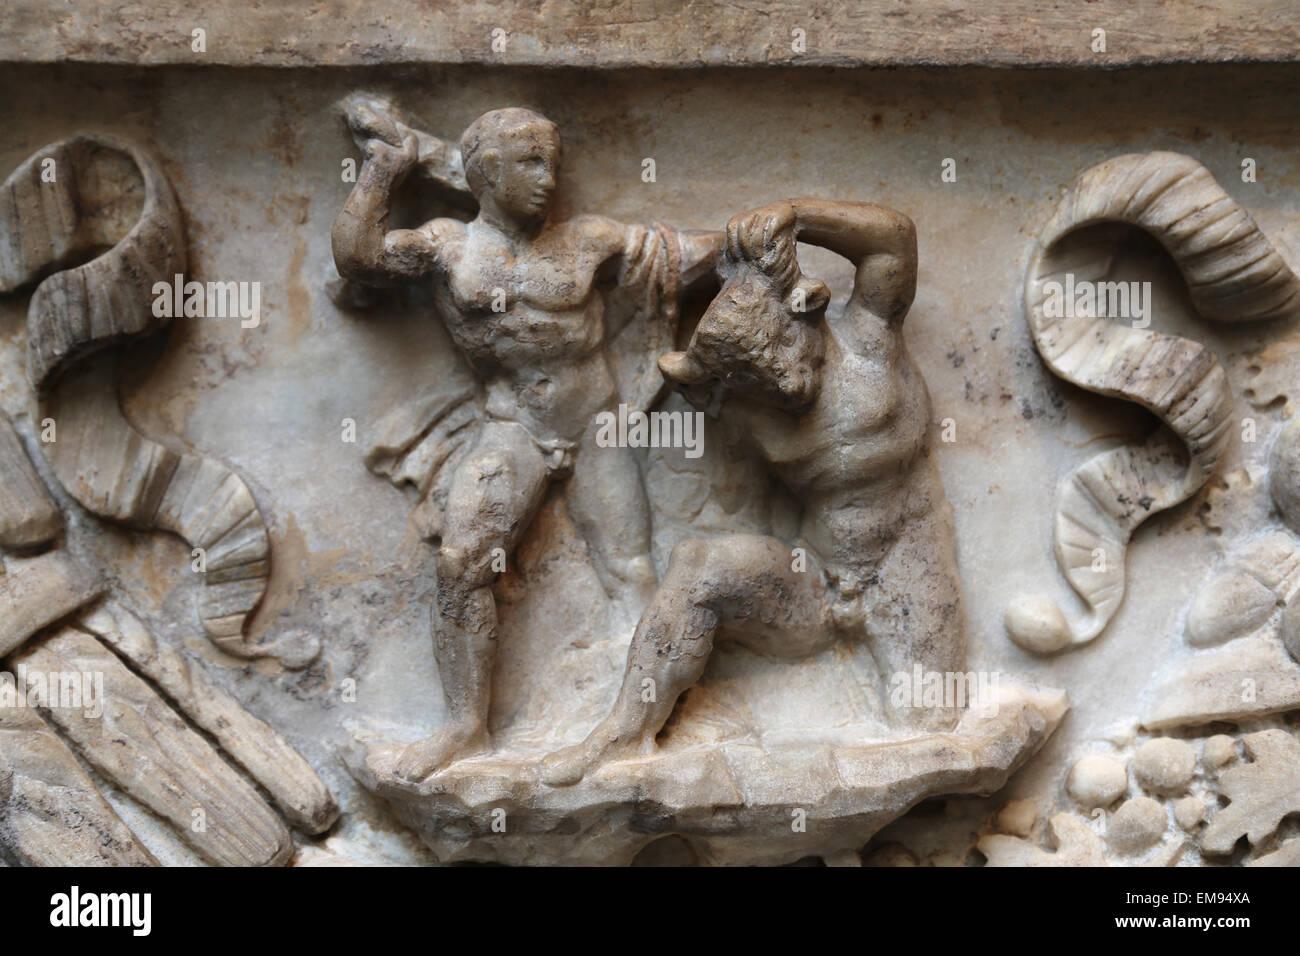 Roman sarcophagus. Myth of Theseus and Ariadne. Marble. C.130-140 AD. Theseus killing the Minotaur. - Stock Image